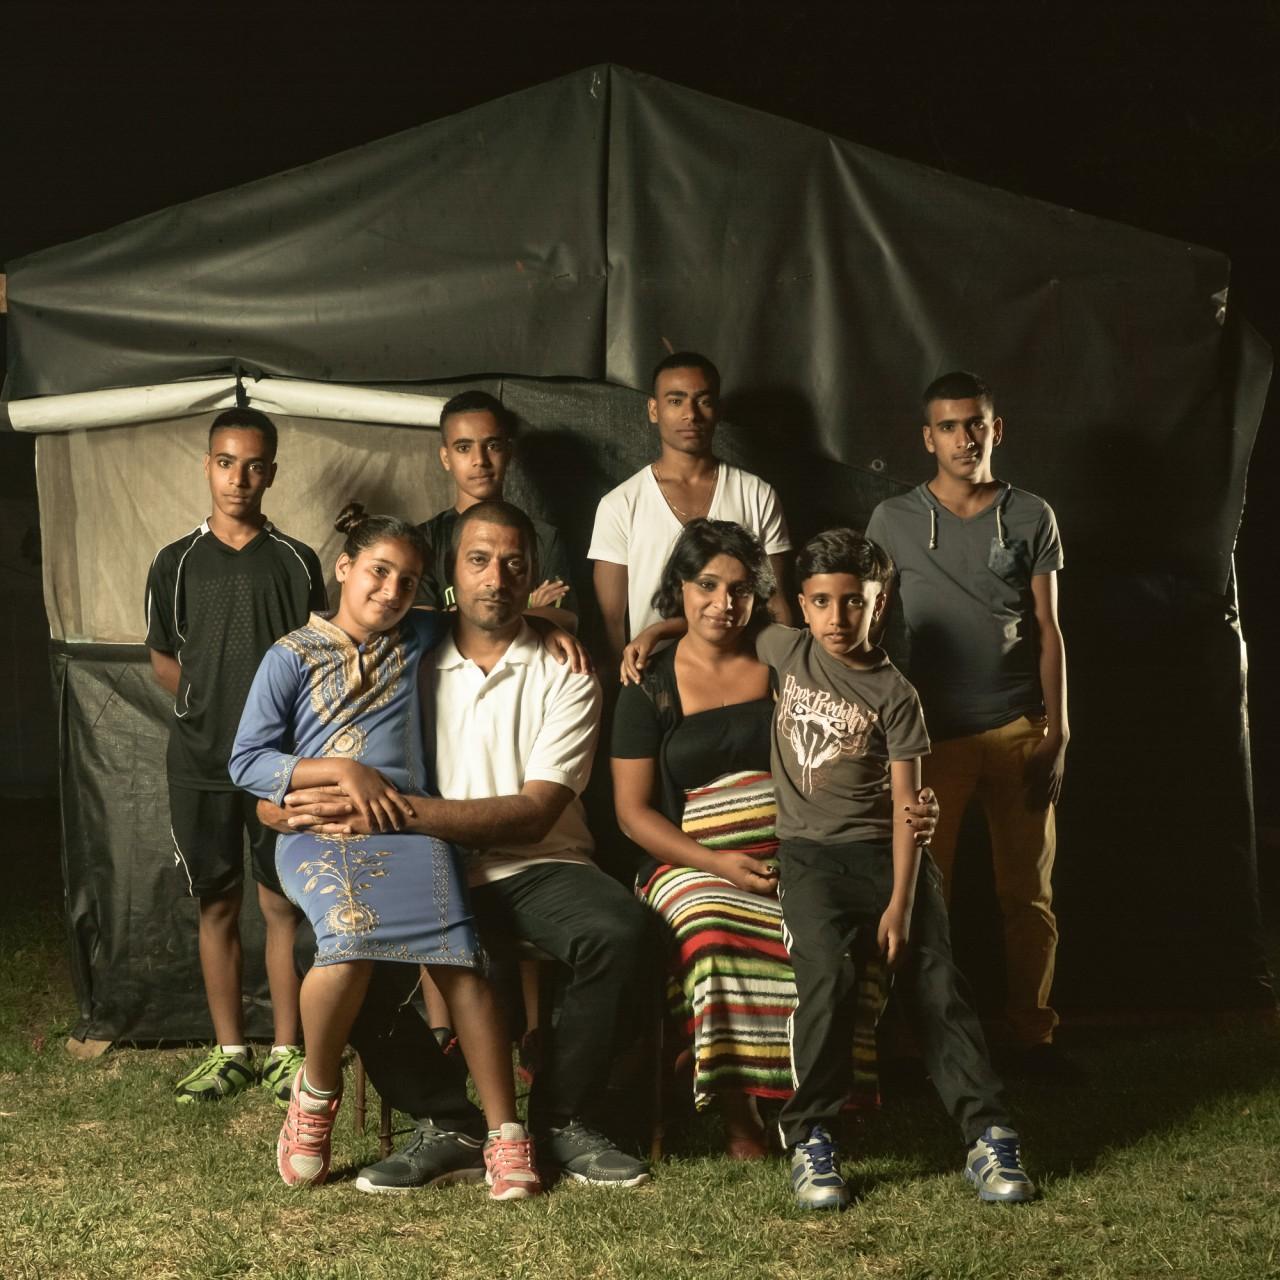 The Iraqis Family